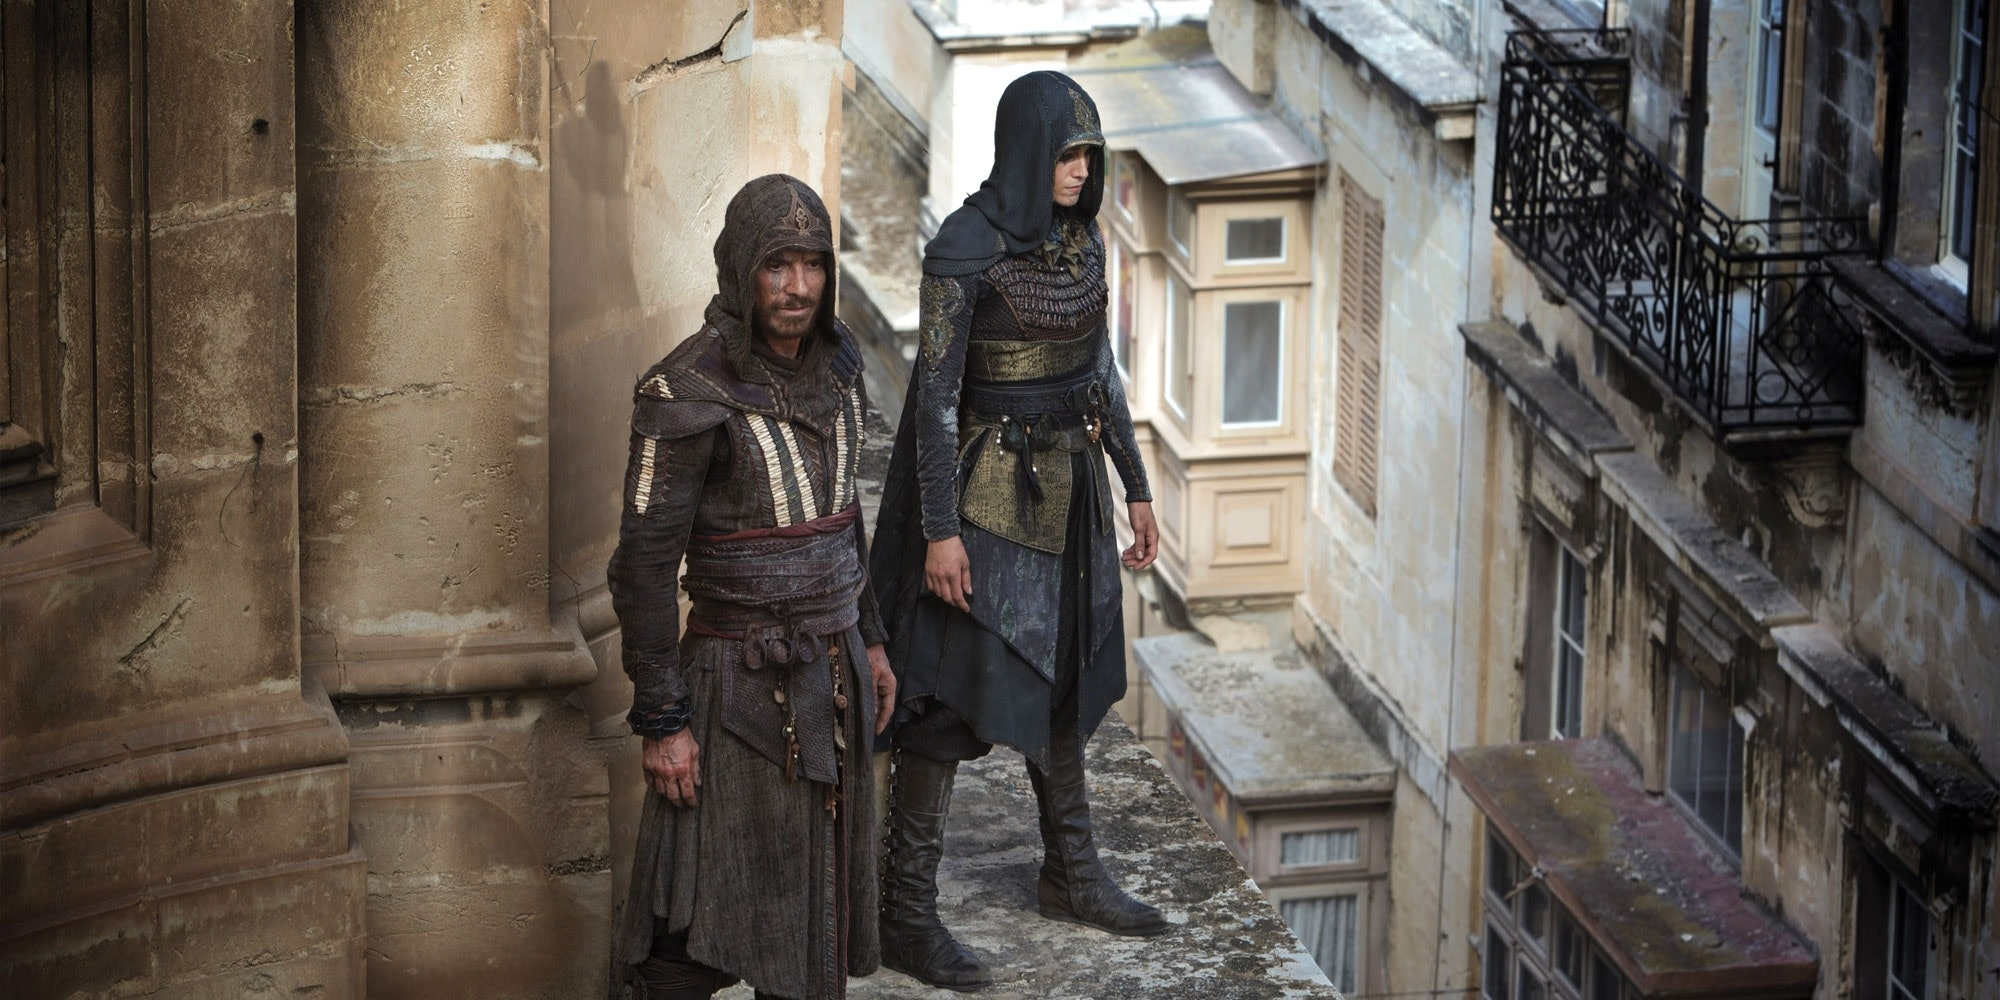 Watch an 'Assassin's Creed' Stuntman Freefall 125 Feet